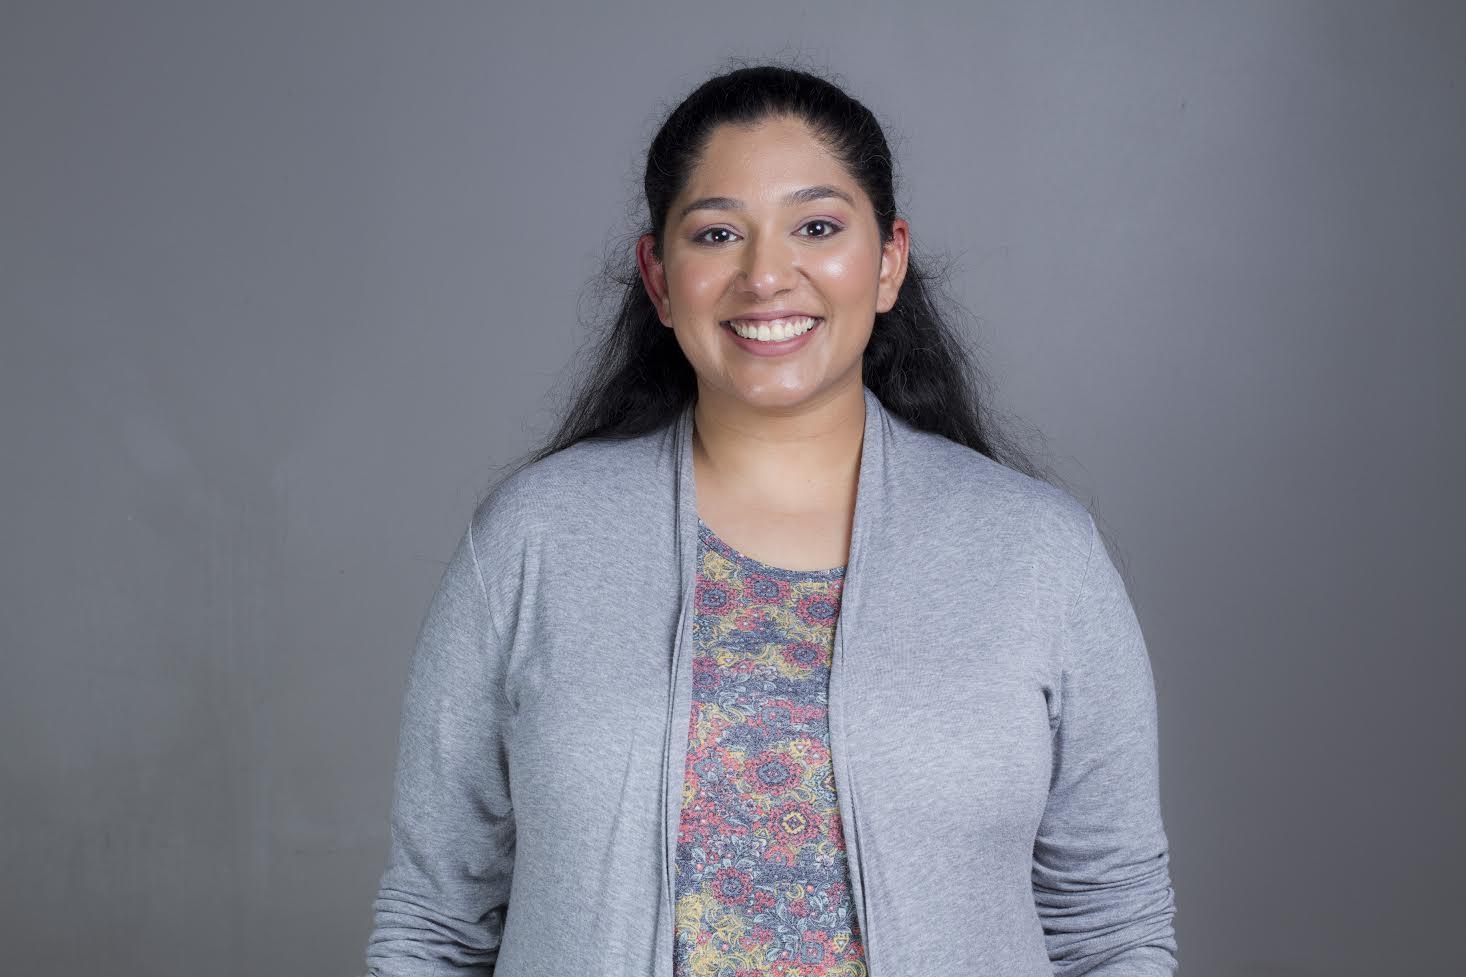 Rachel Suarez